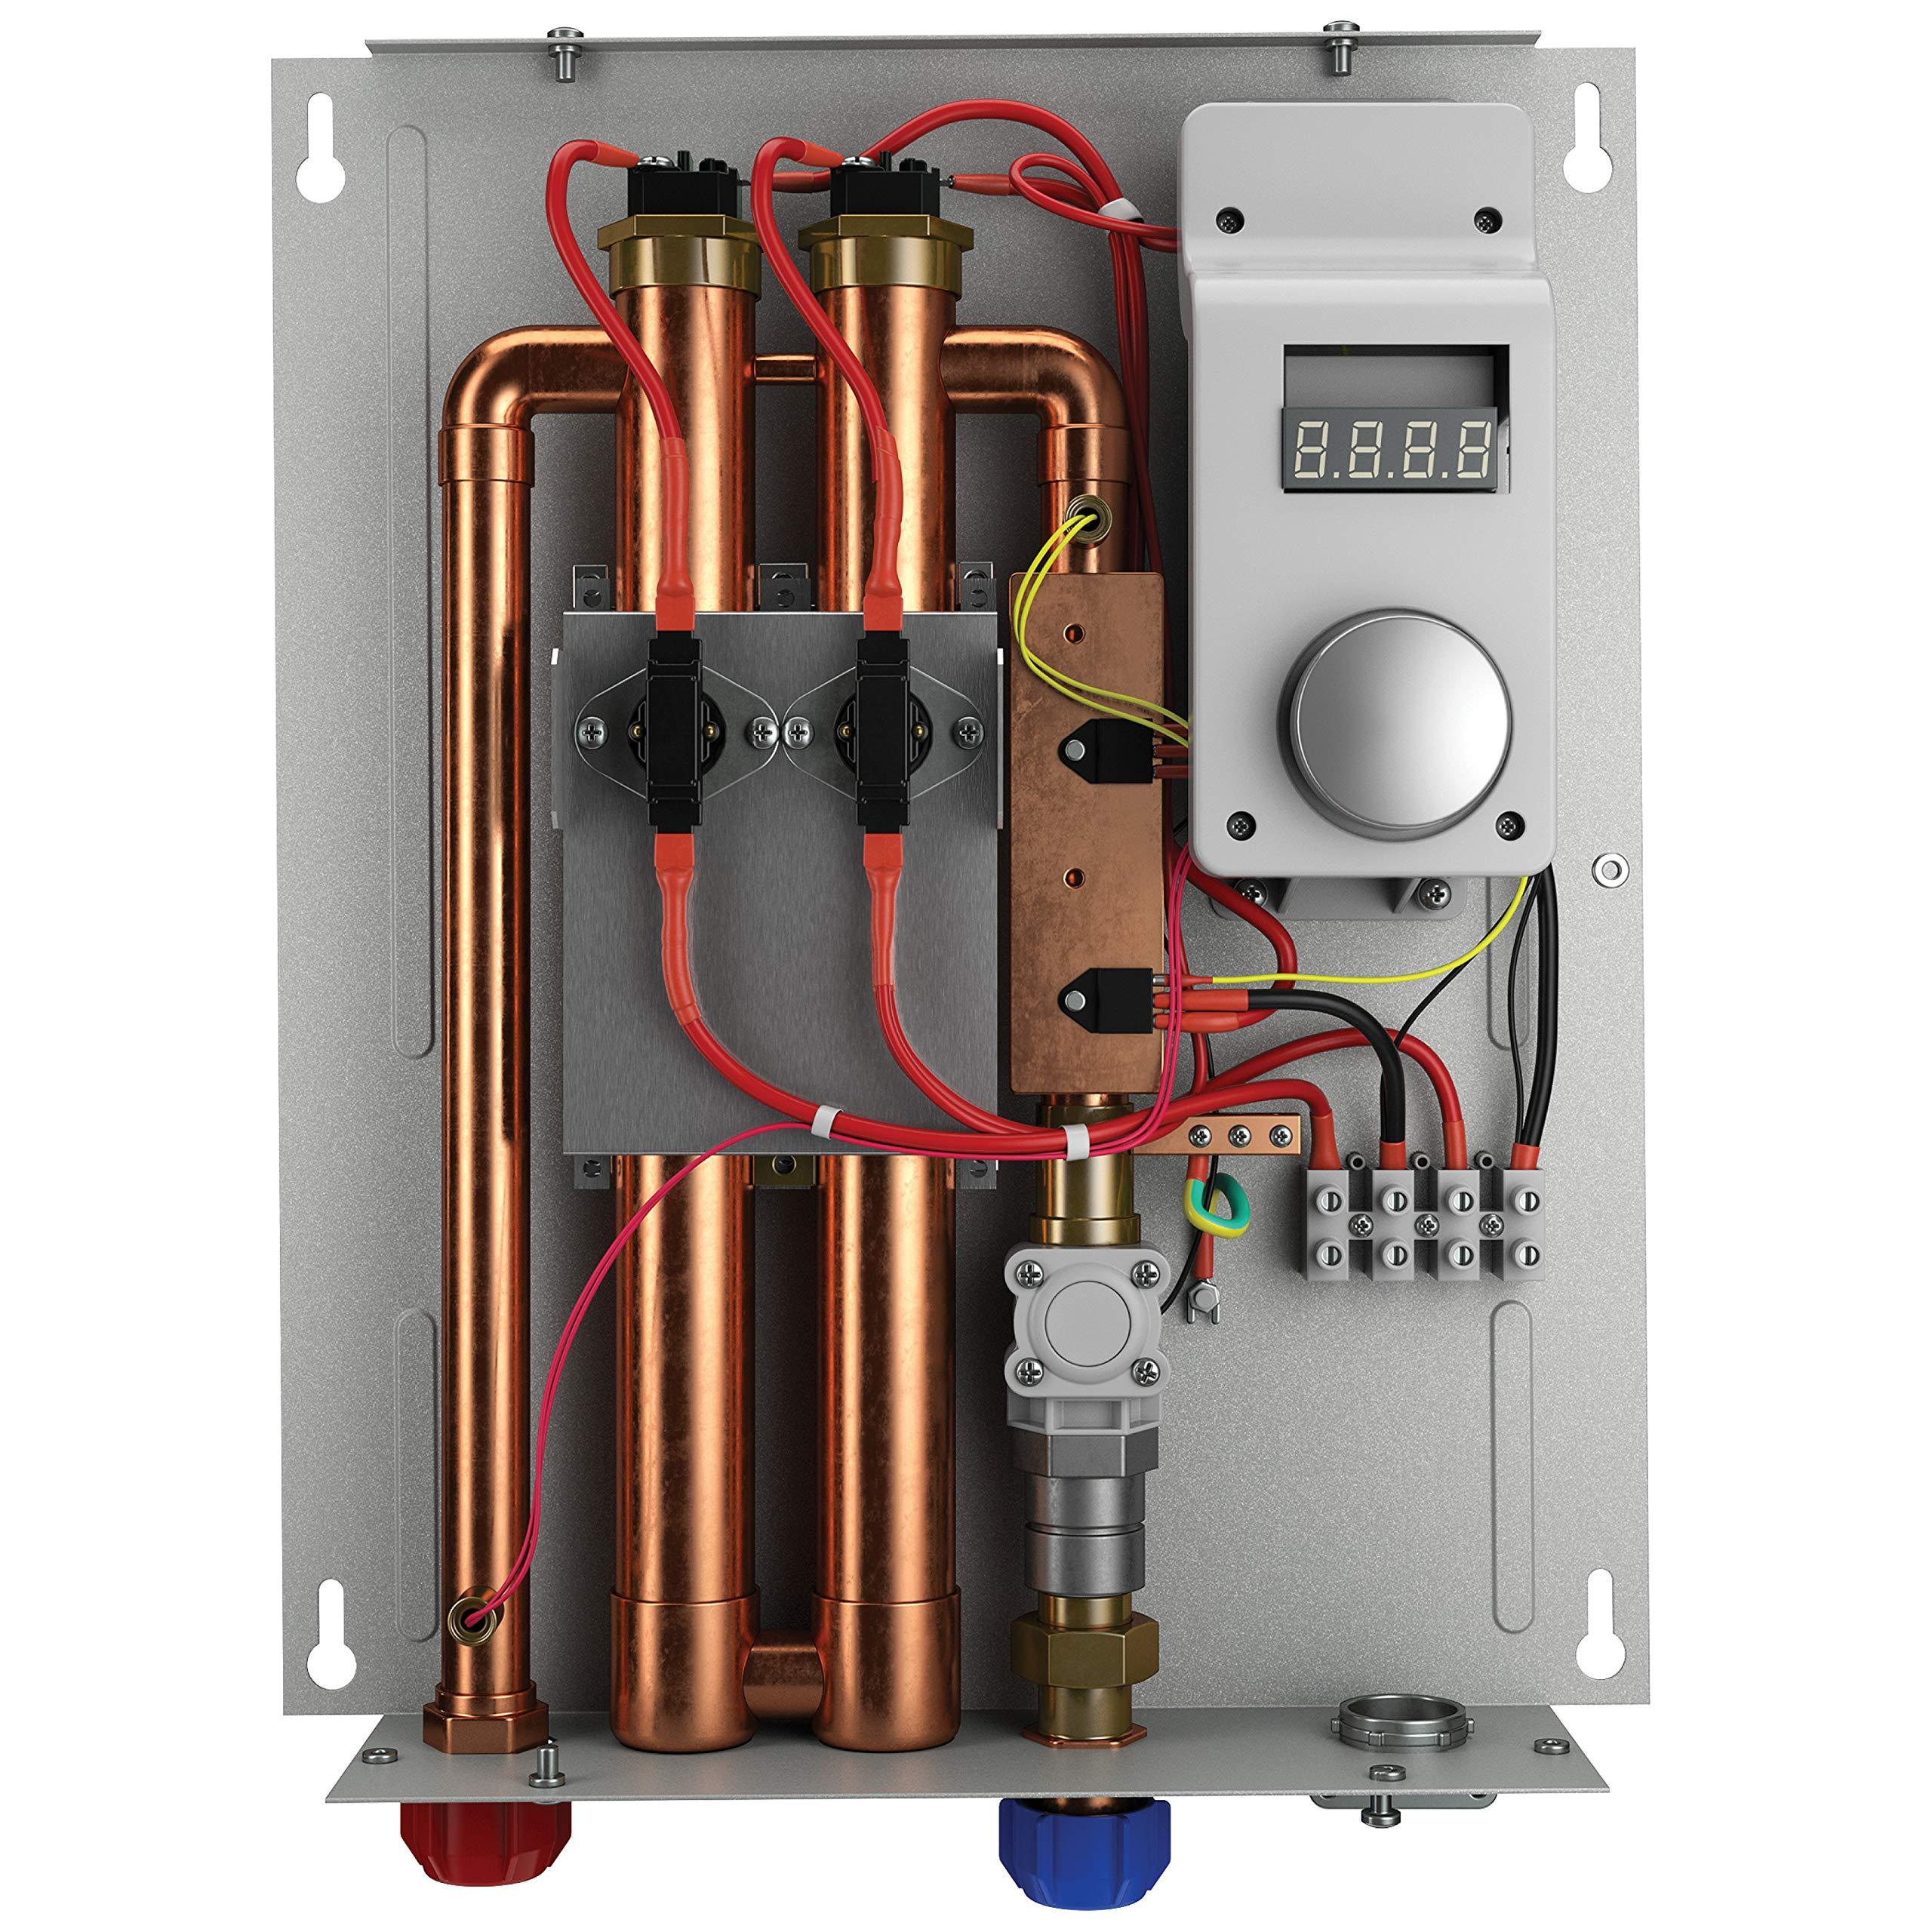 Rheem RTEX-18 18kW 240V Electric Tankless Water Heater, small, Gray - -  Amazon.comAmazon.com